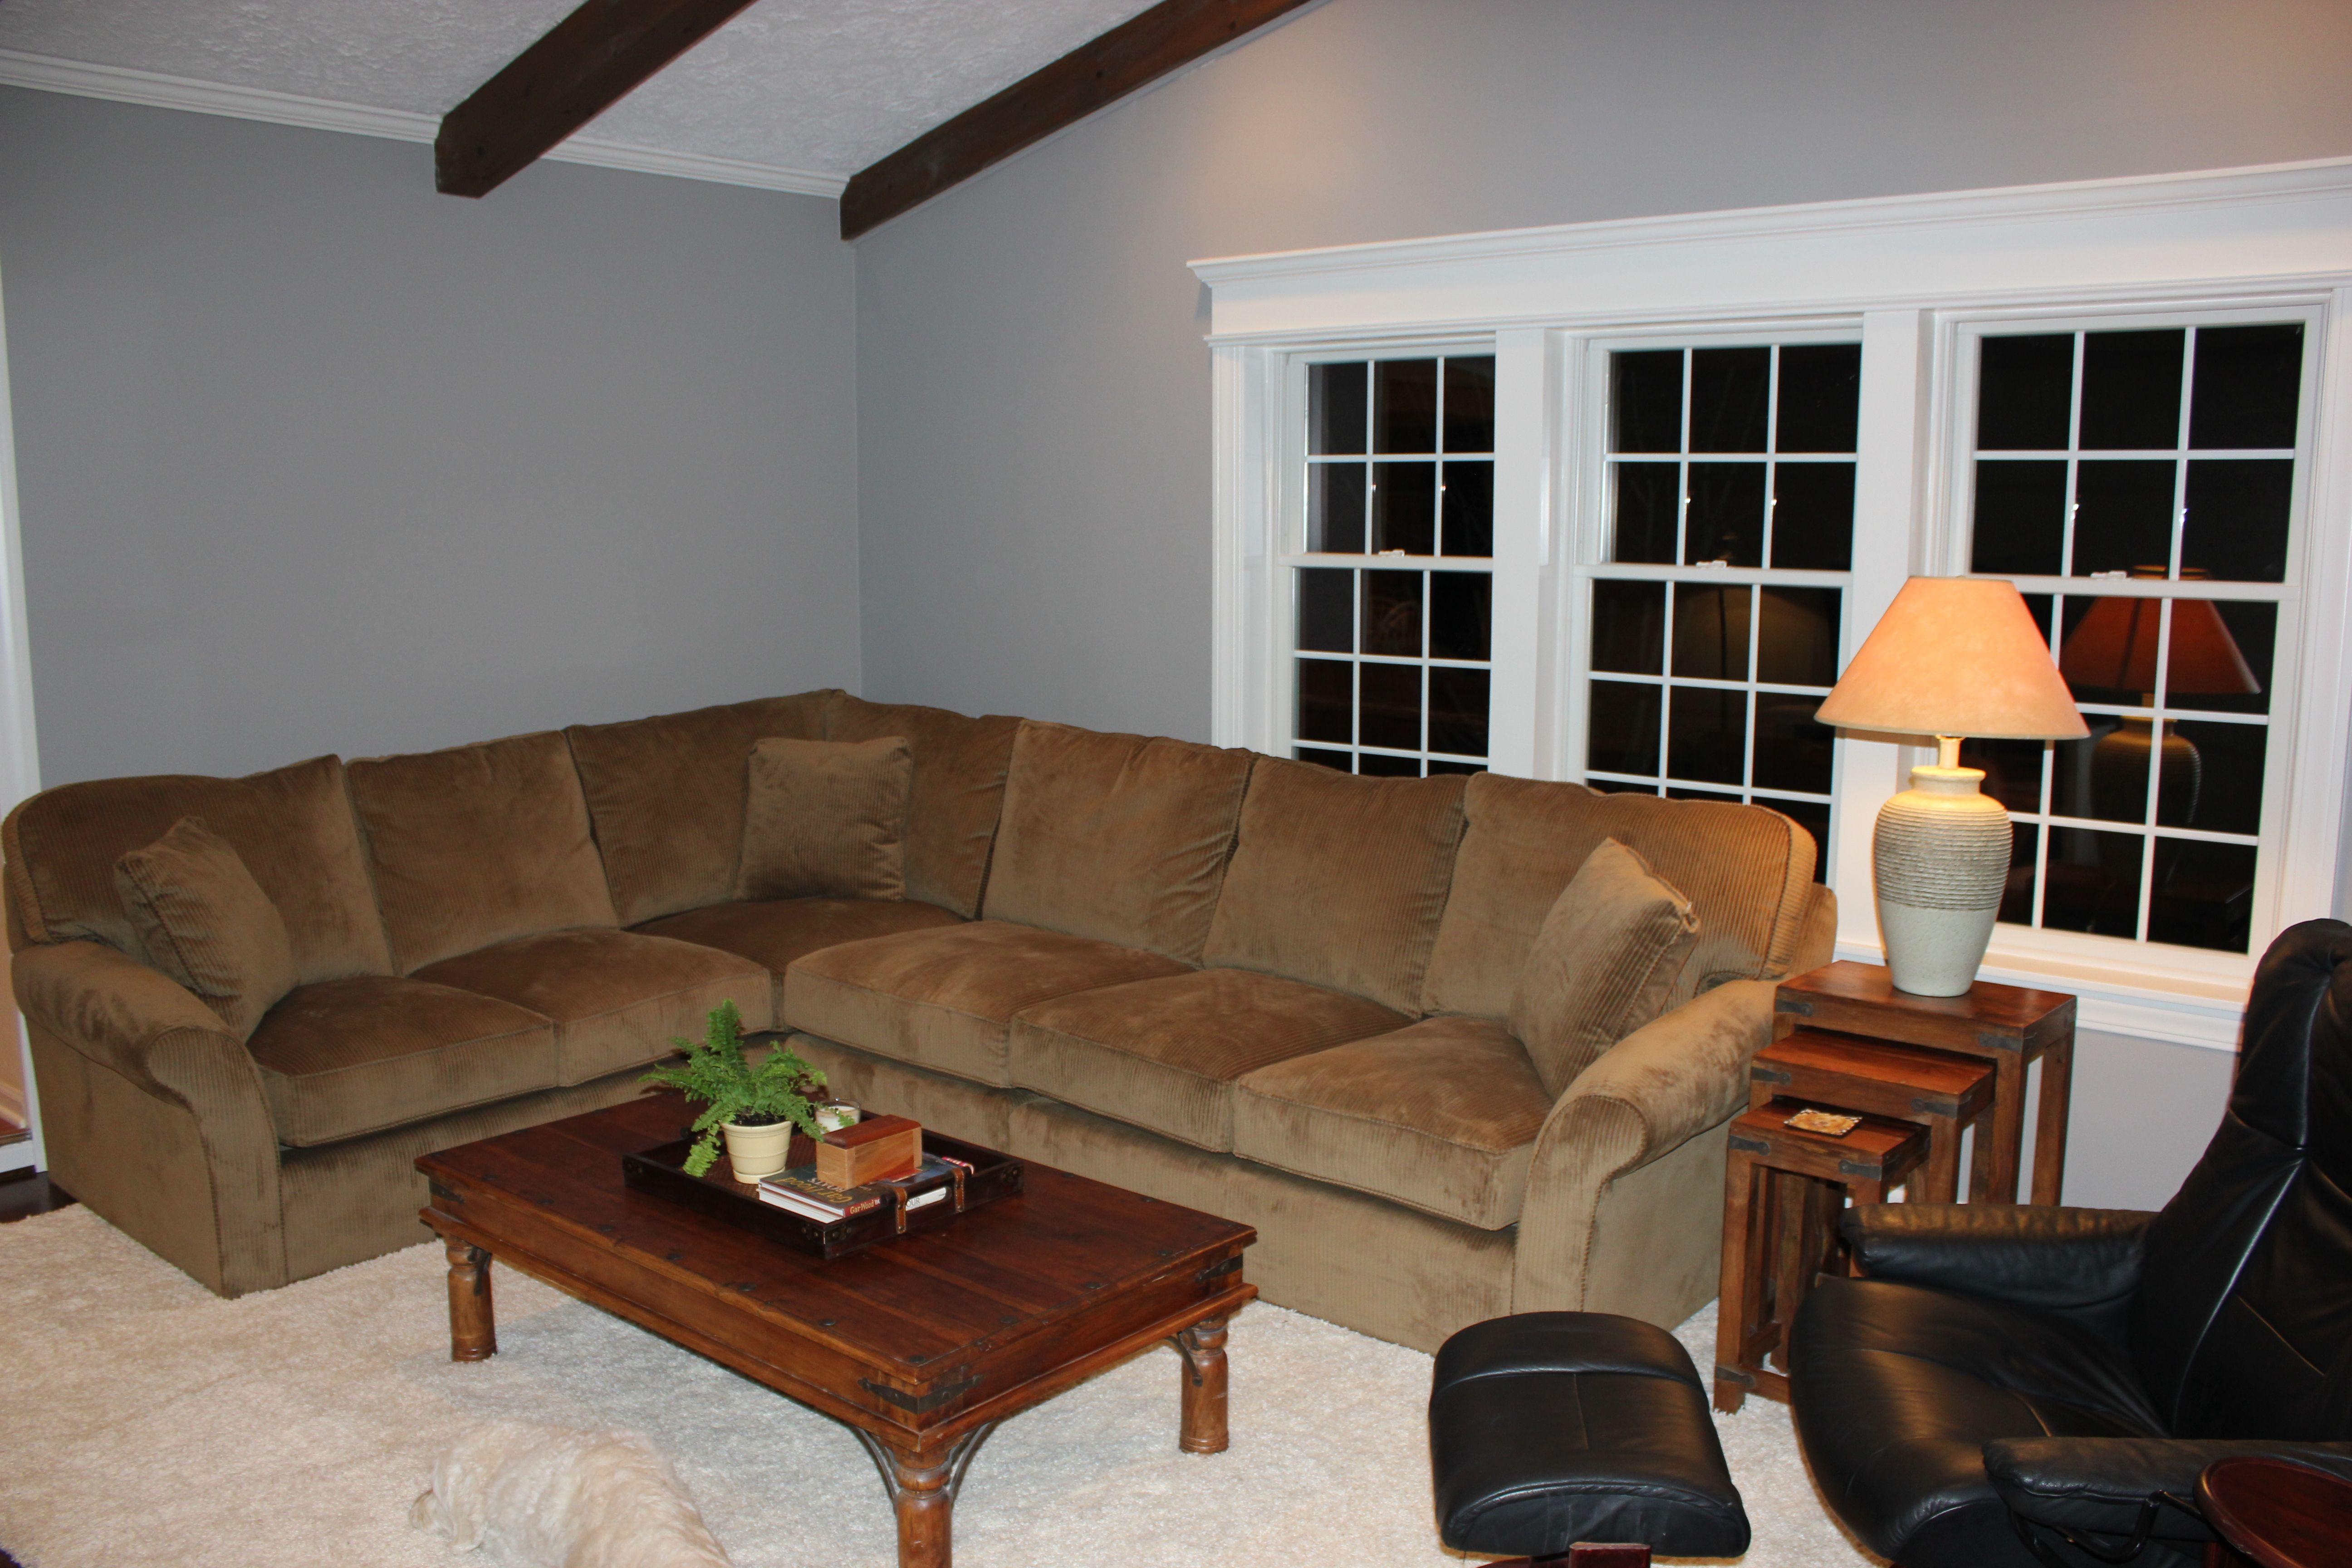 New Family Room Benjamin Moore Baltic Gray Paint